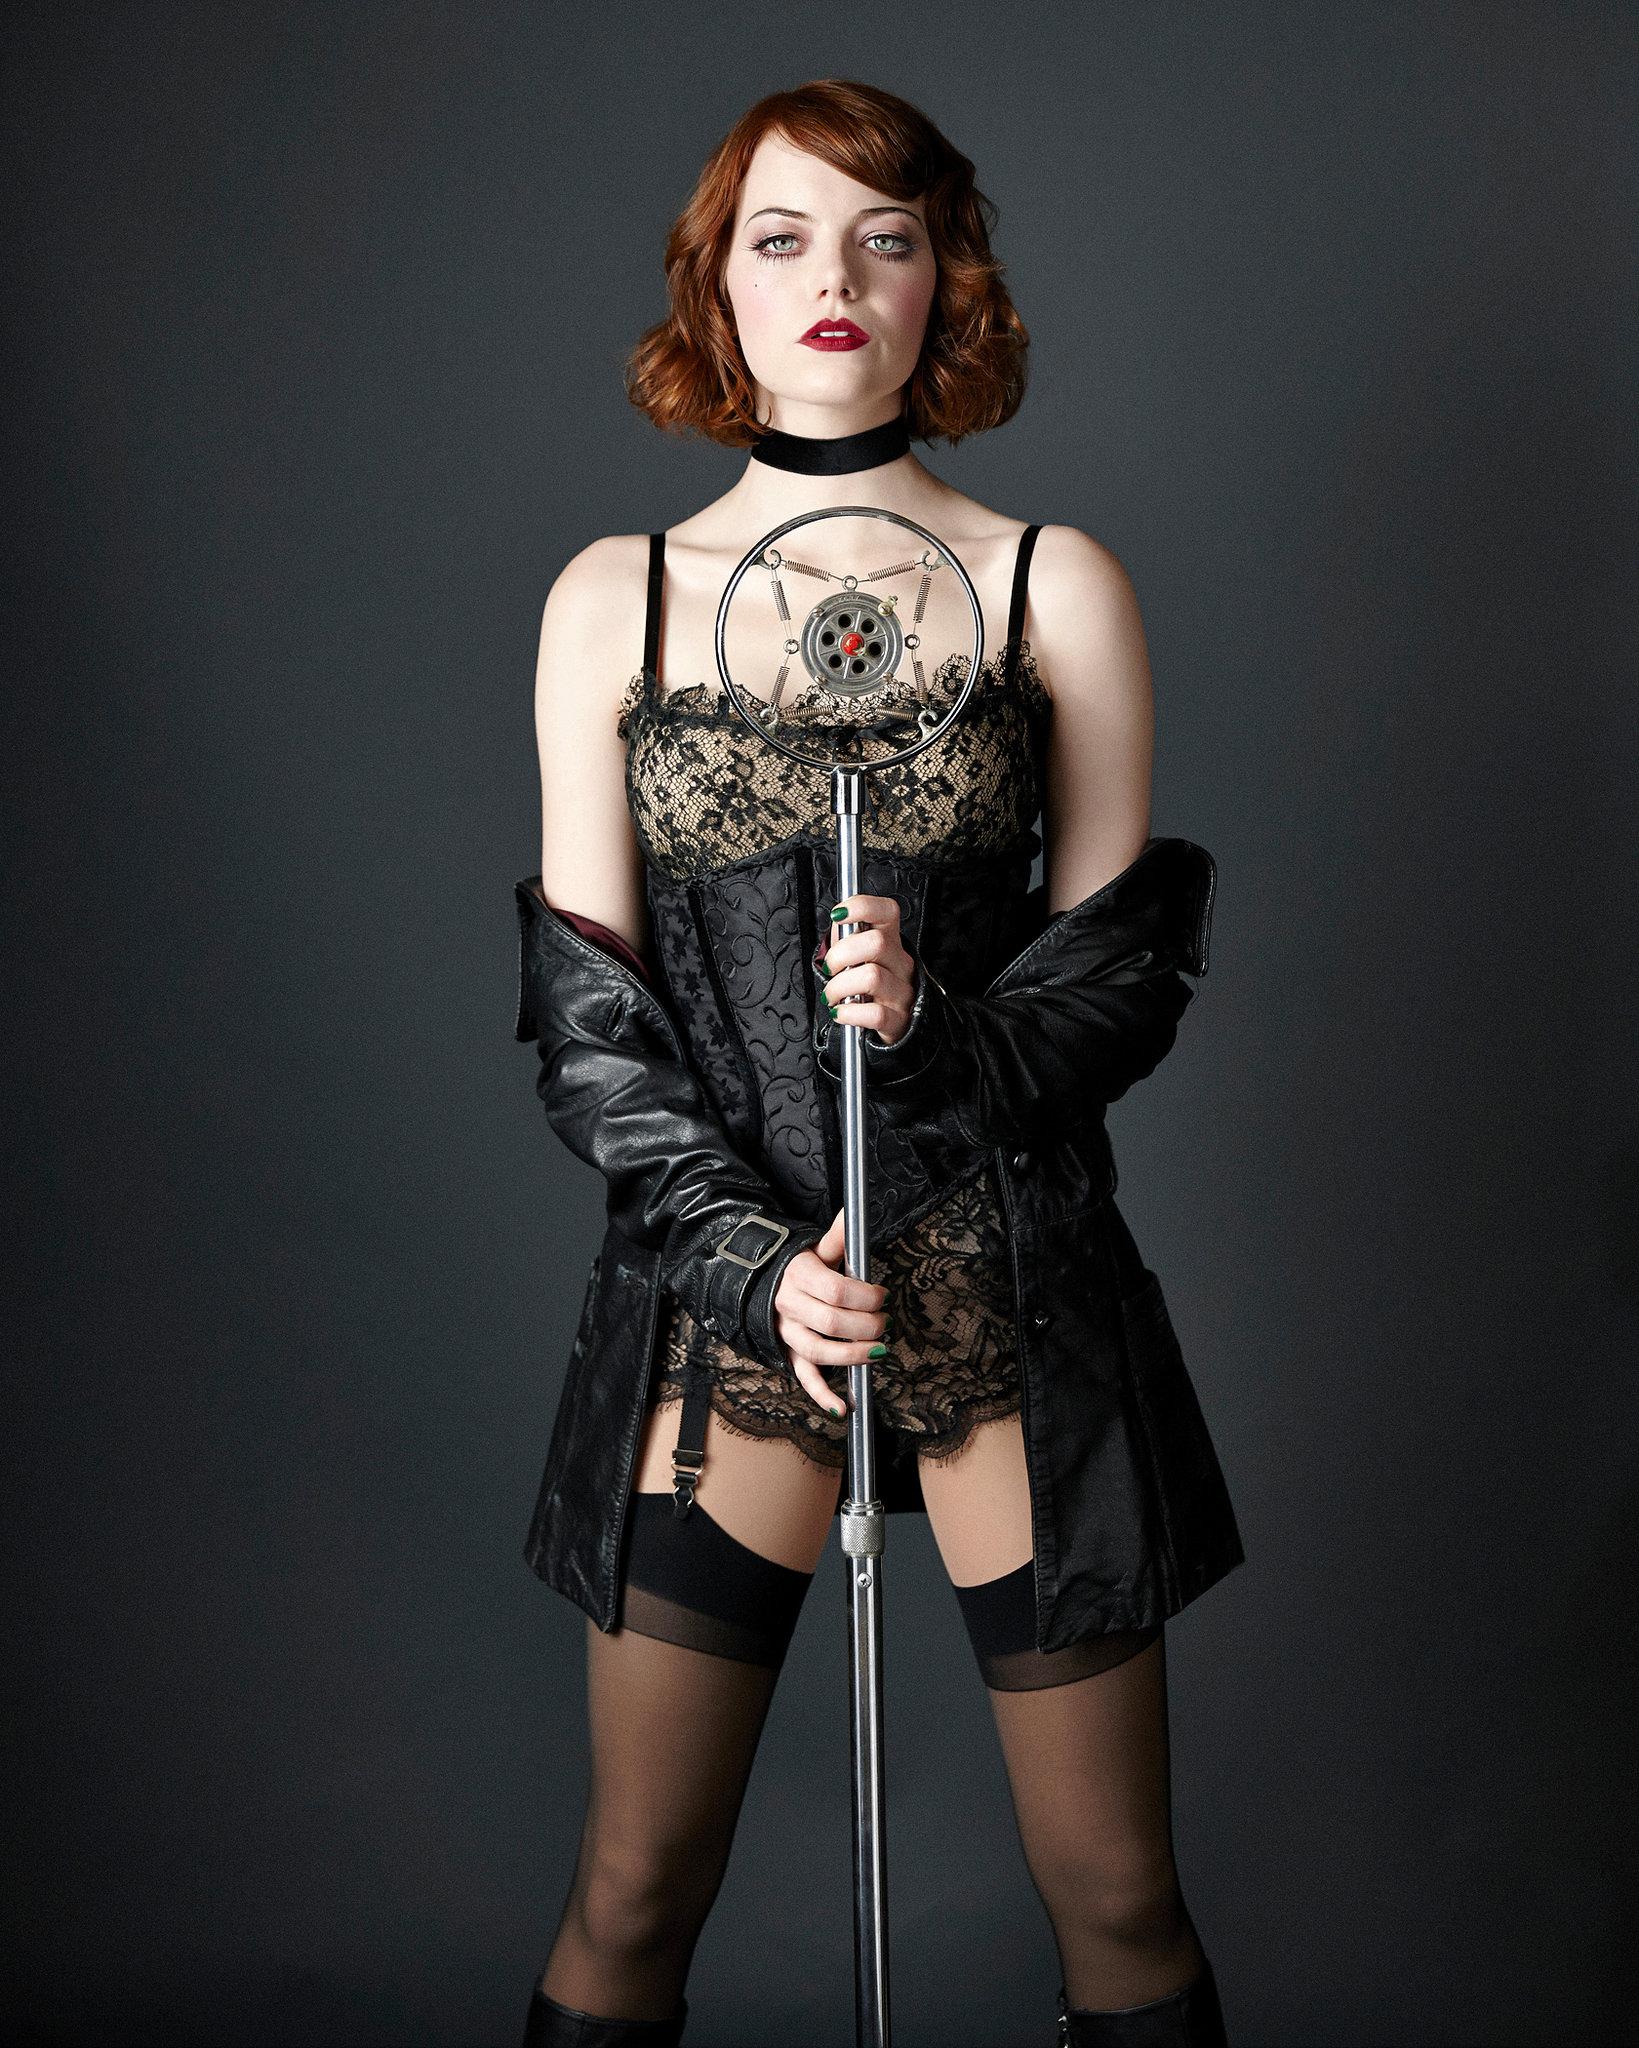 Emma Stone: Vanity Fair 2014 - Cabaret Prmo -03 - GotCeleb Emma Stone